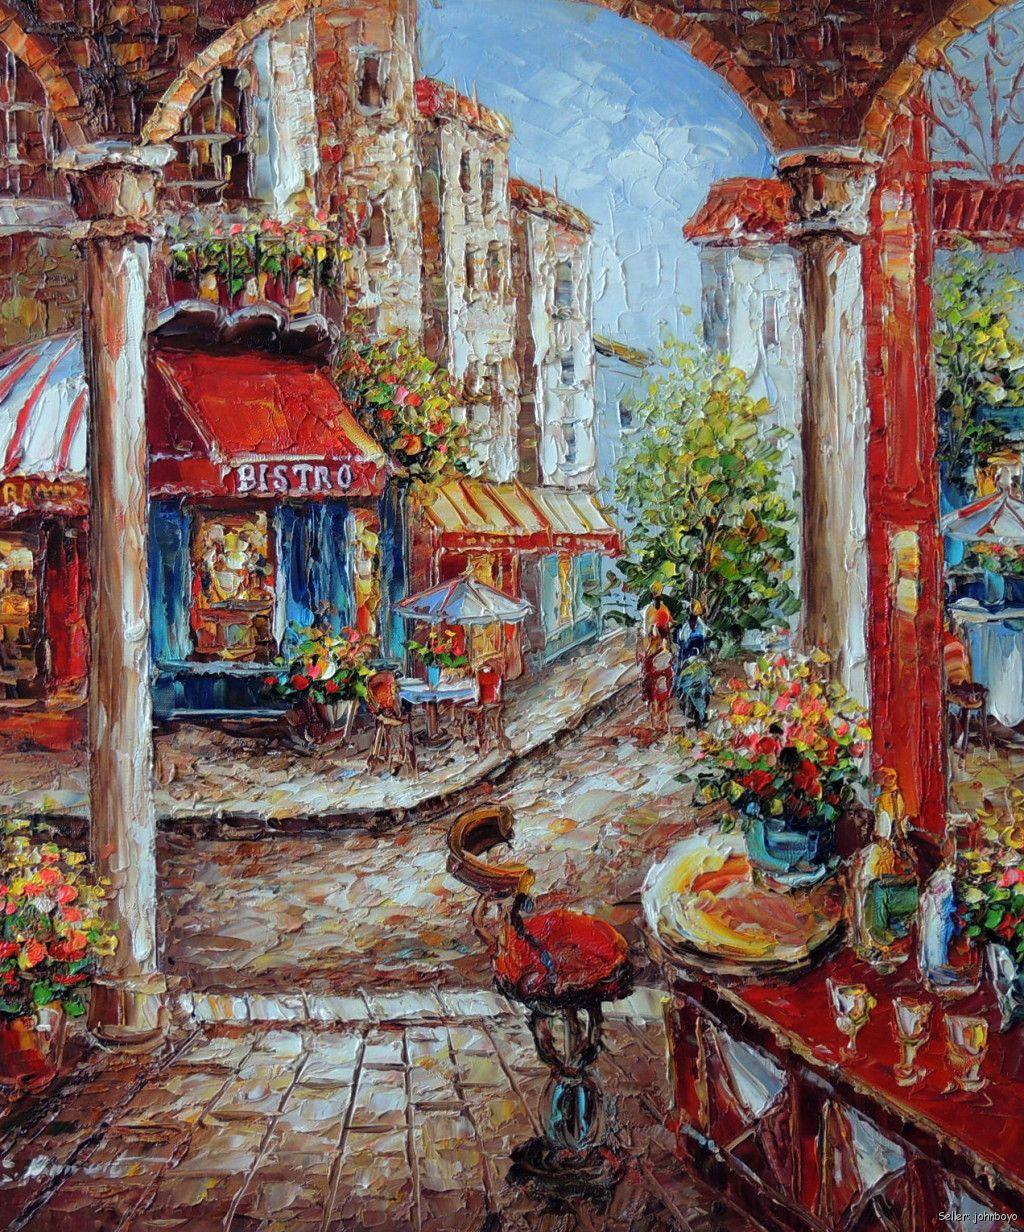 Italian Town Bistro Bar Restaurant Flowers Sidewalk Table